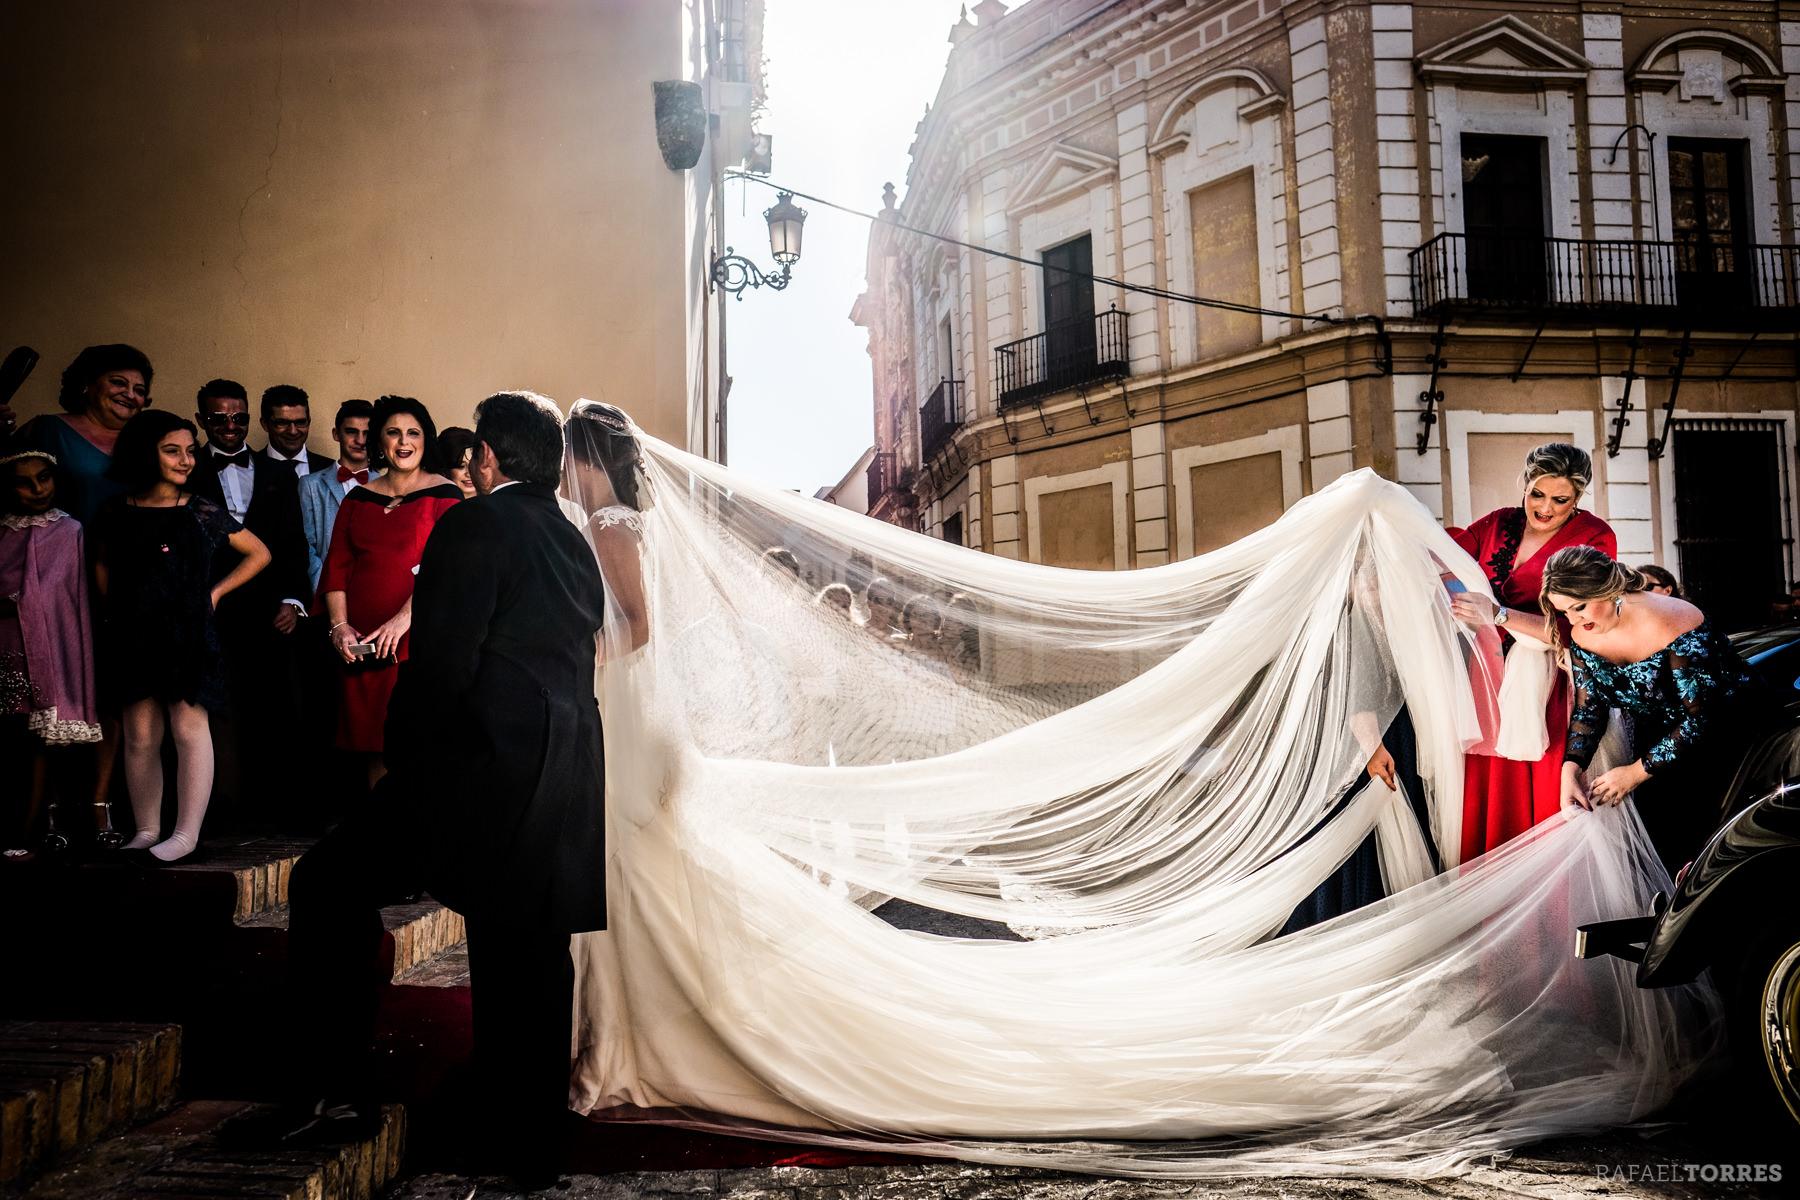 bea-juan-carmona-fotografo-boda-en-sevilla-rafael-torres-photo-28.jpg